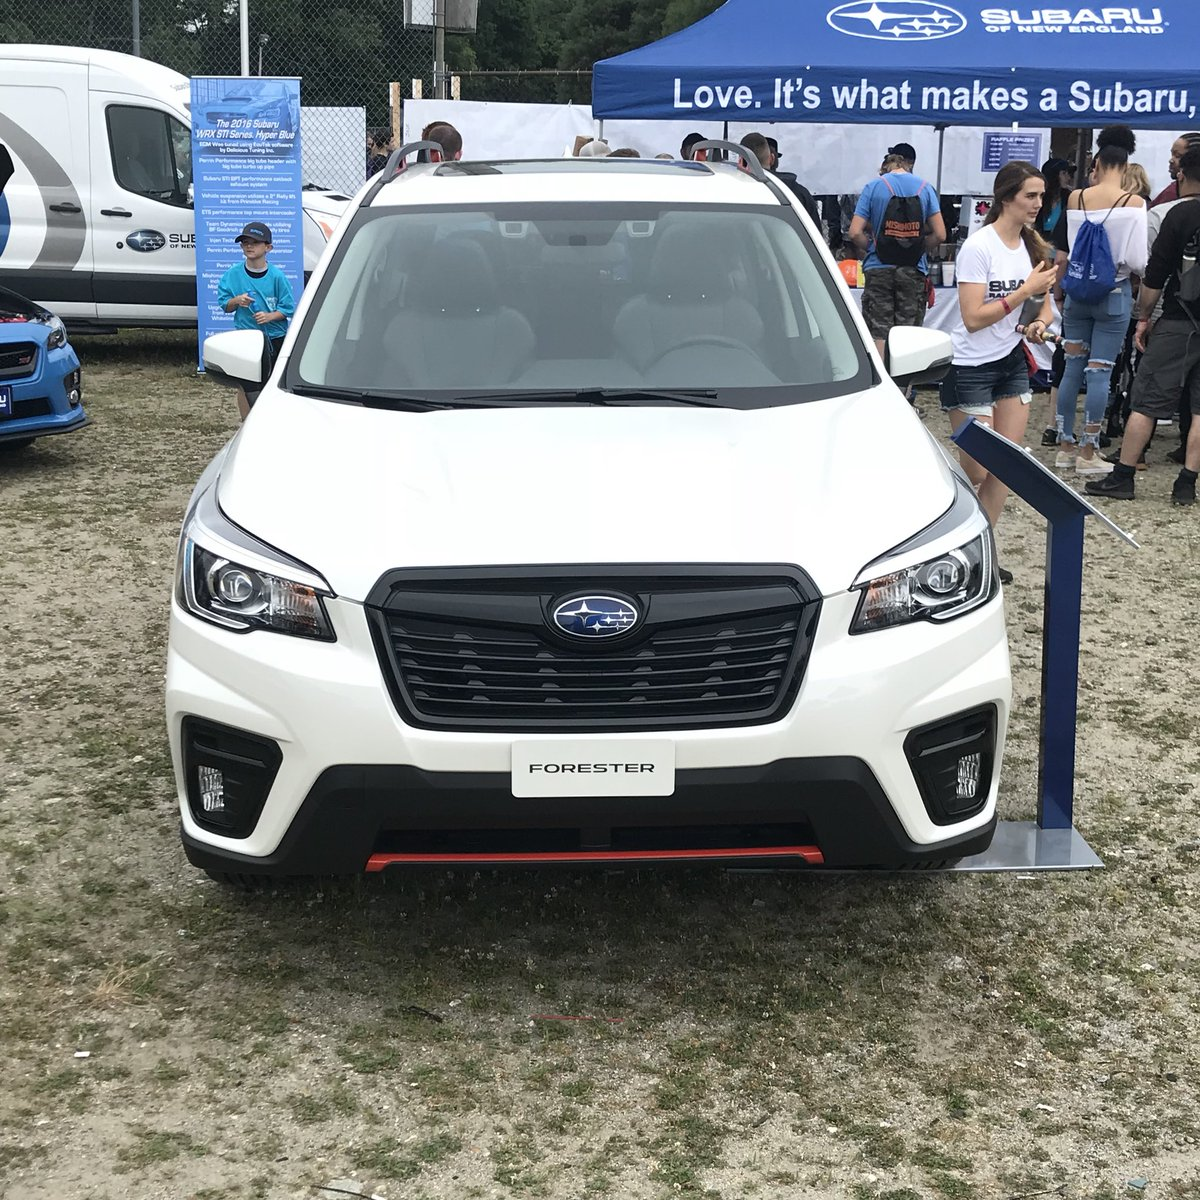 Subaru Of New England >> Subaruofnewengland On Twitter Another New England Debut